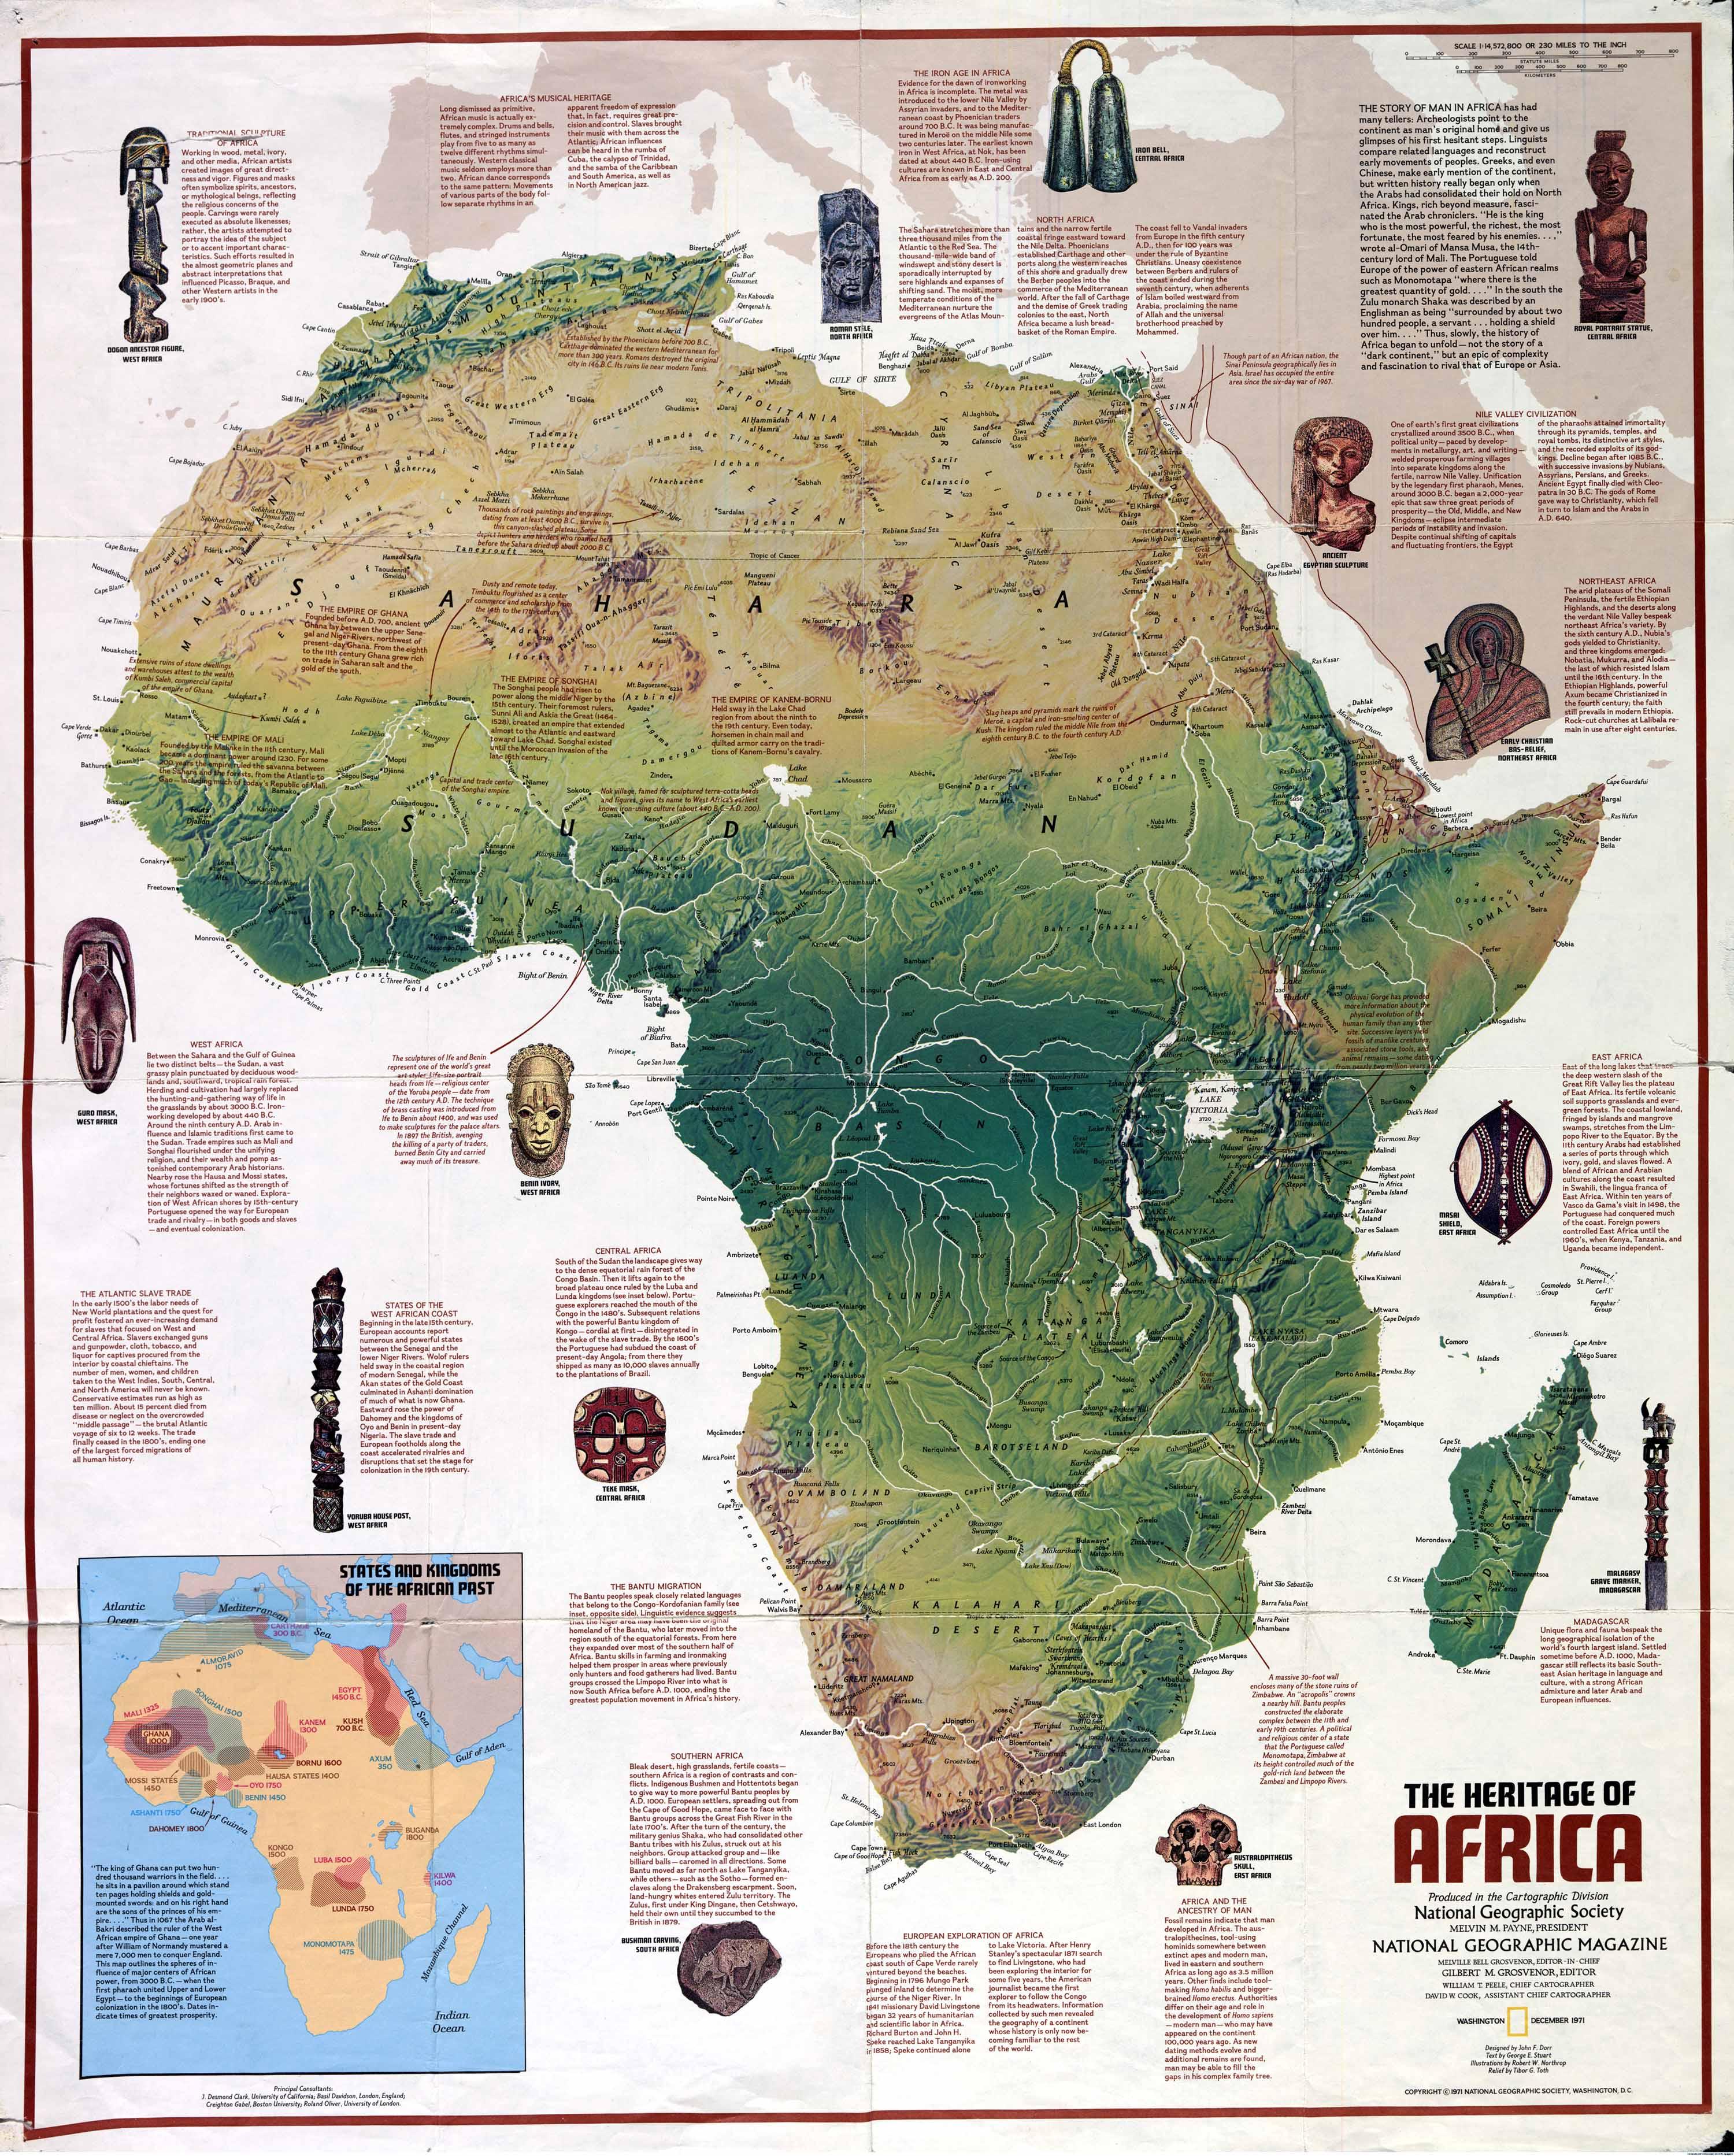 Mission Discover Sub Saharan Africa